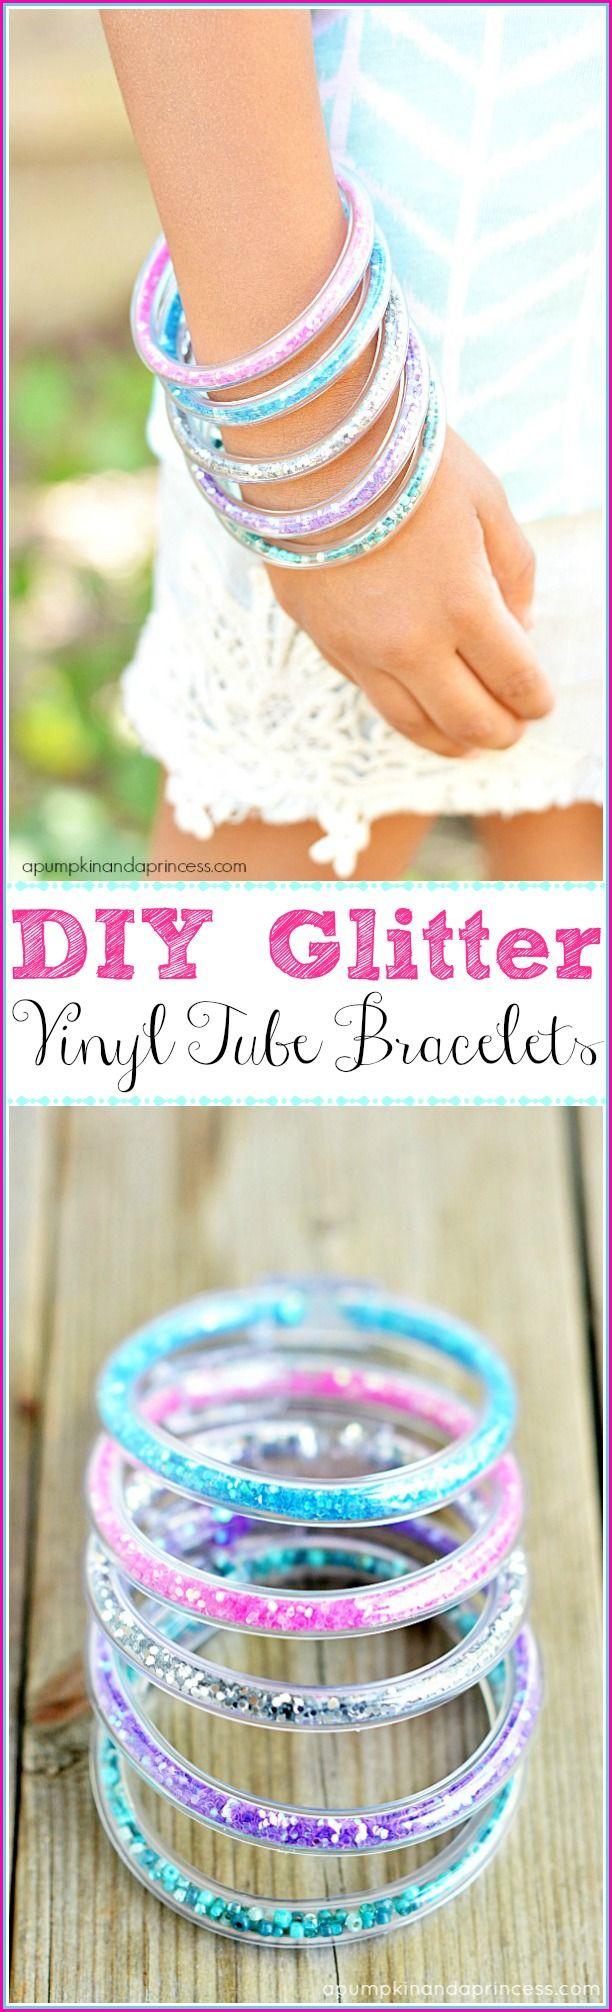 DIY glitter tube bracelets: Diy Frozen Jewelry Parties, Crafts Ideas, Glitter Vinyls, Diy Tube, Diy Glitter, Diy Bead Bracelets For Girls, Craft Ideas, Vinyls Tube, Tube Bracelets